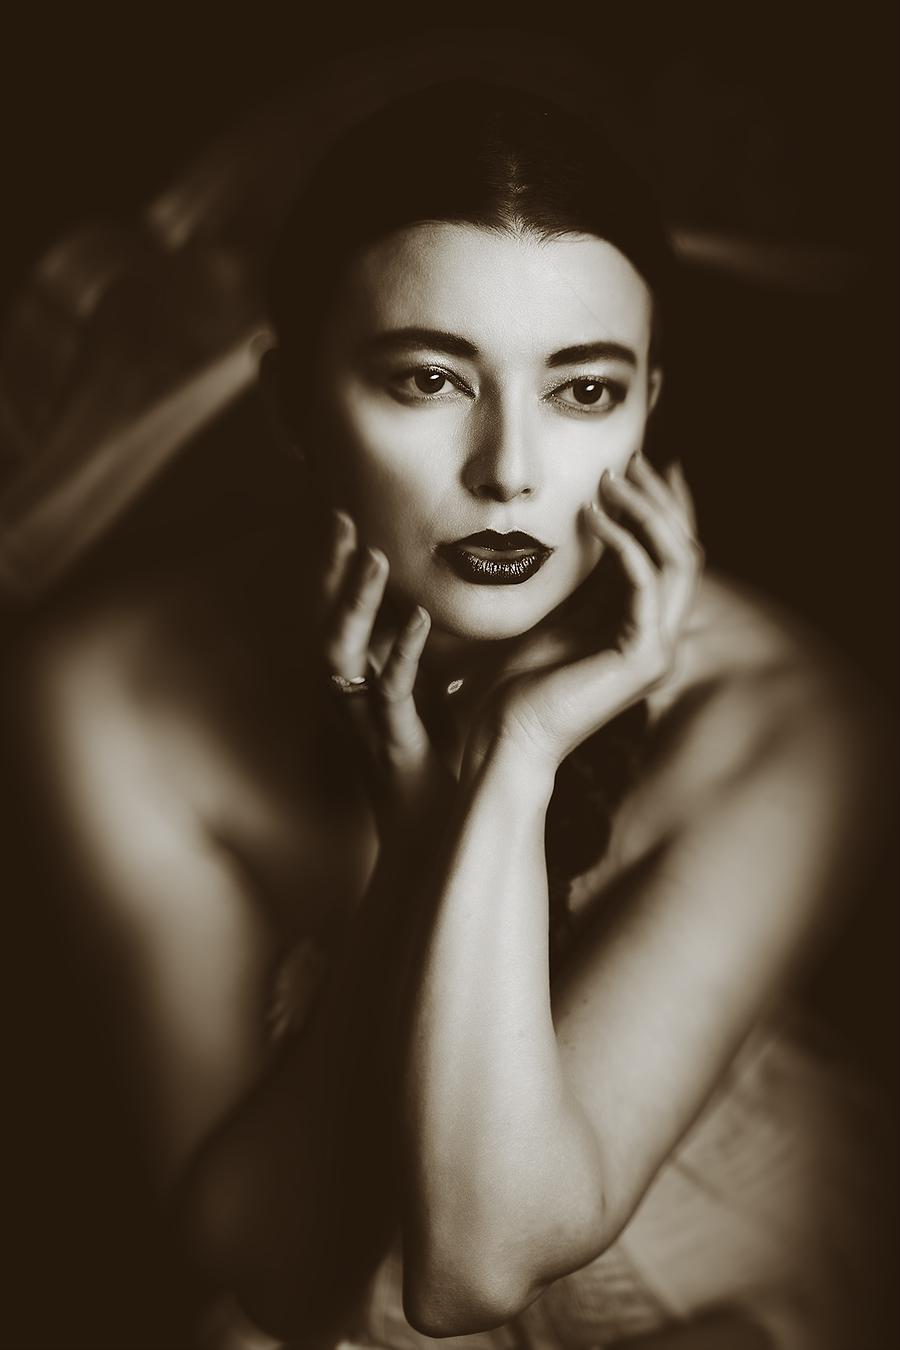 1930's feel / Photography by jakabi, Model Helen Diaz, Taken at Full Moon Studio / Uploaded 8th April 2016 @ 05:44 PM